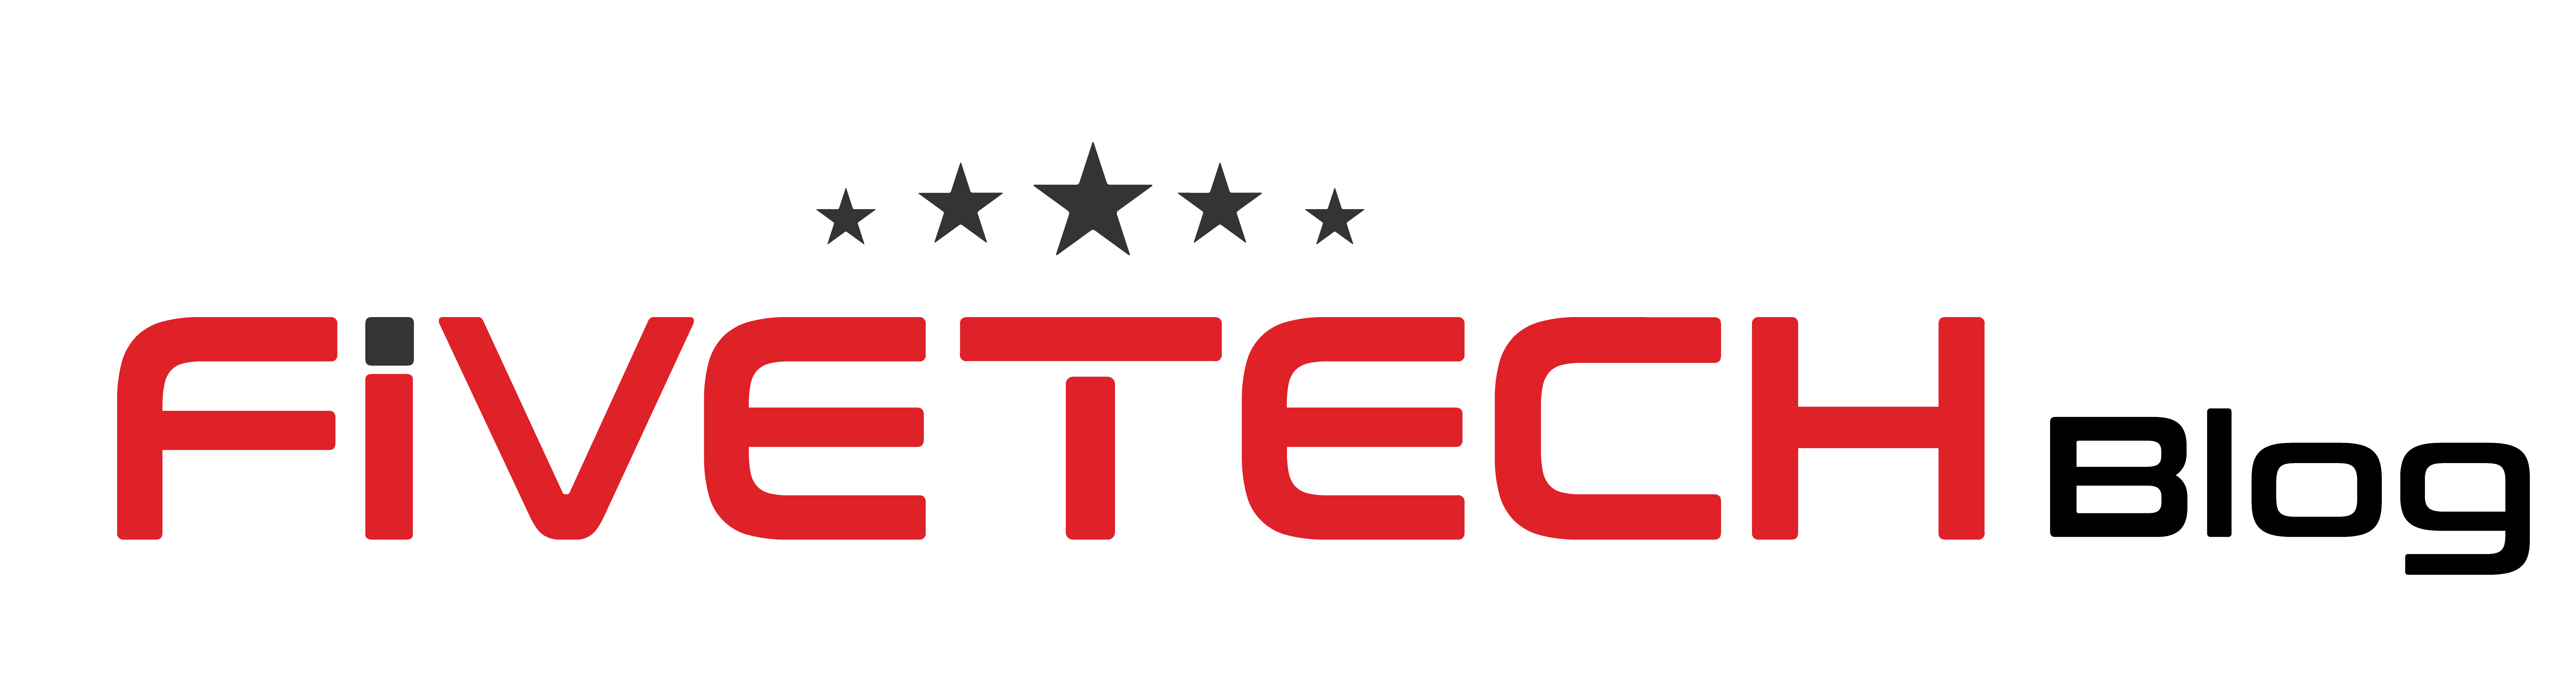 Five Tech Blog